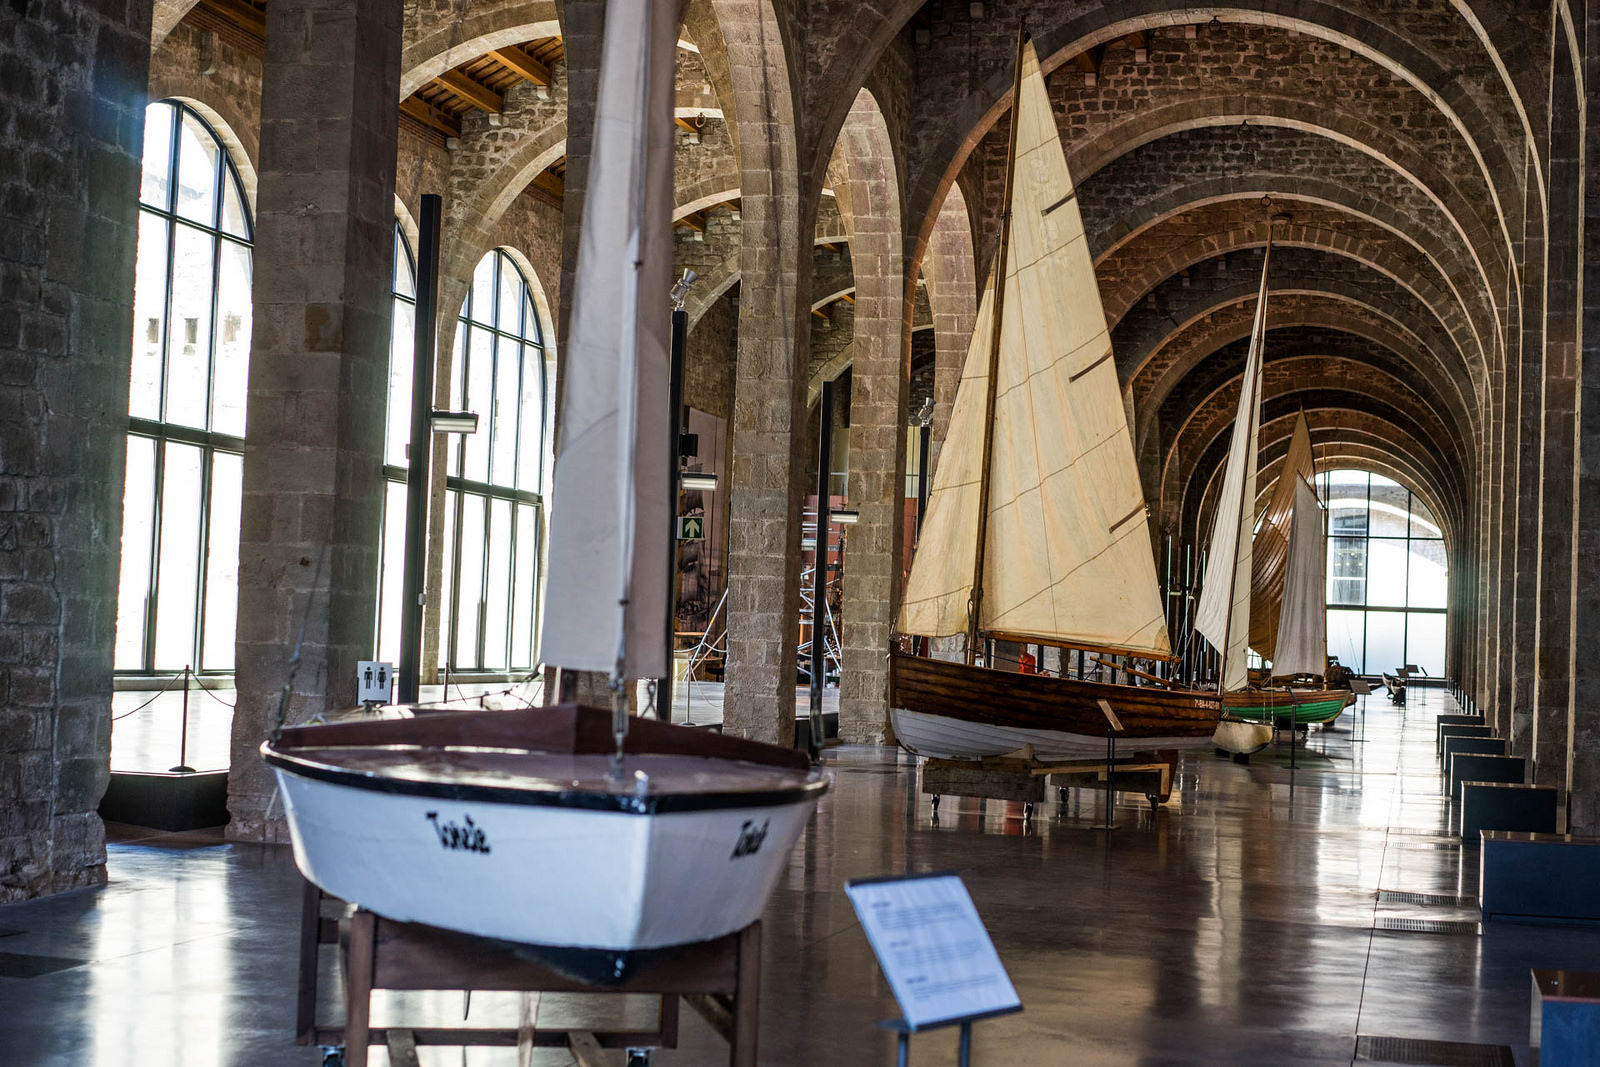 Морской музей Барселоны, интерьер